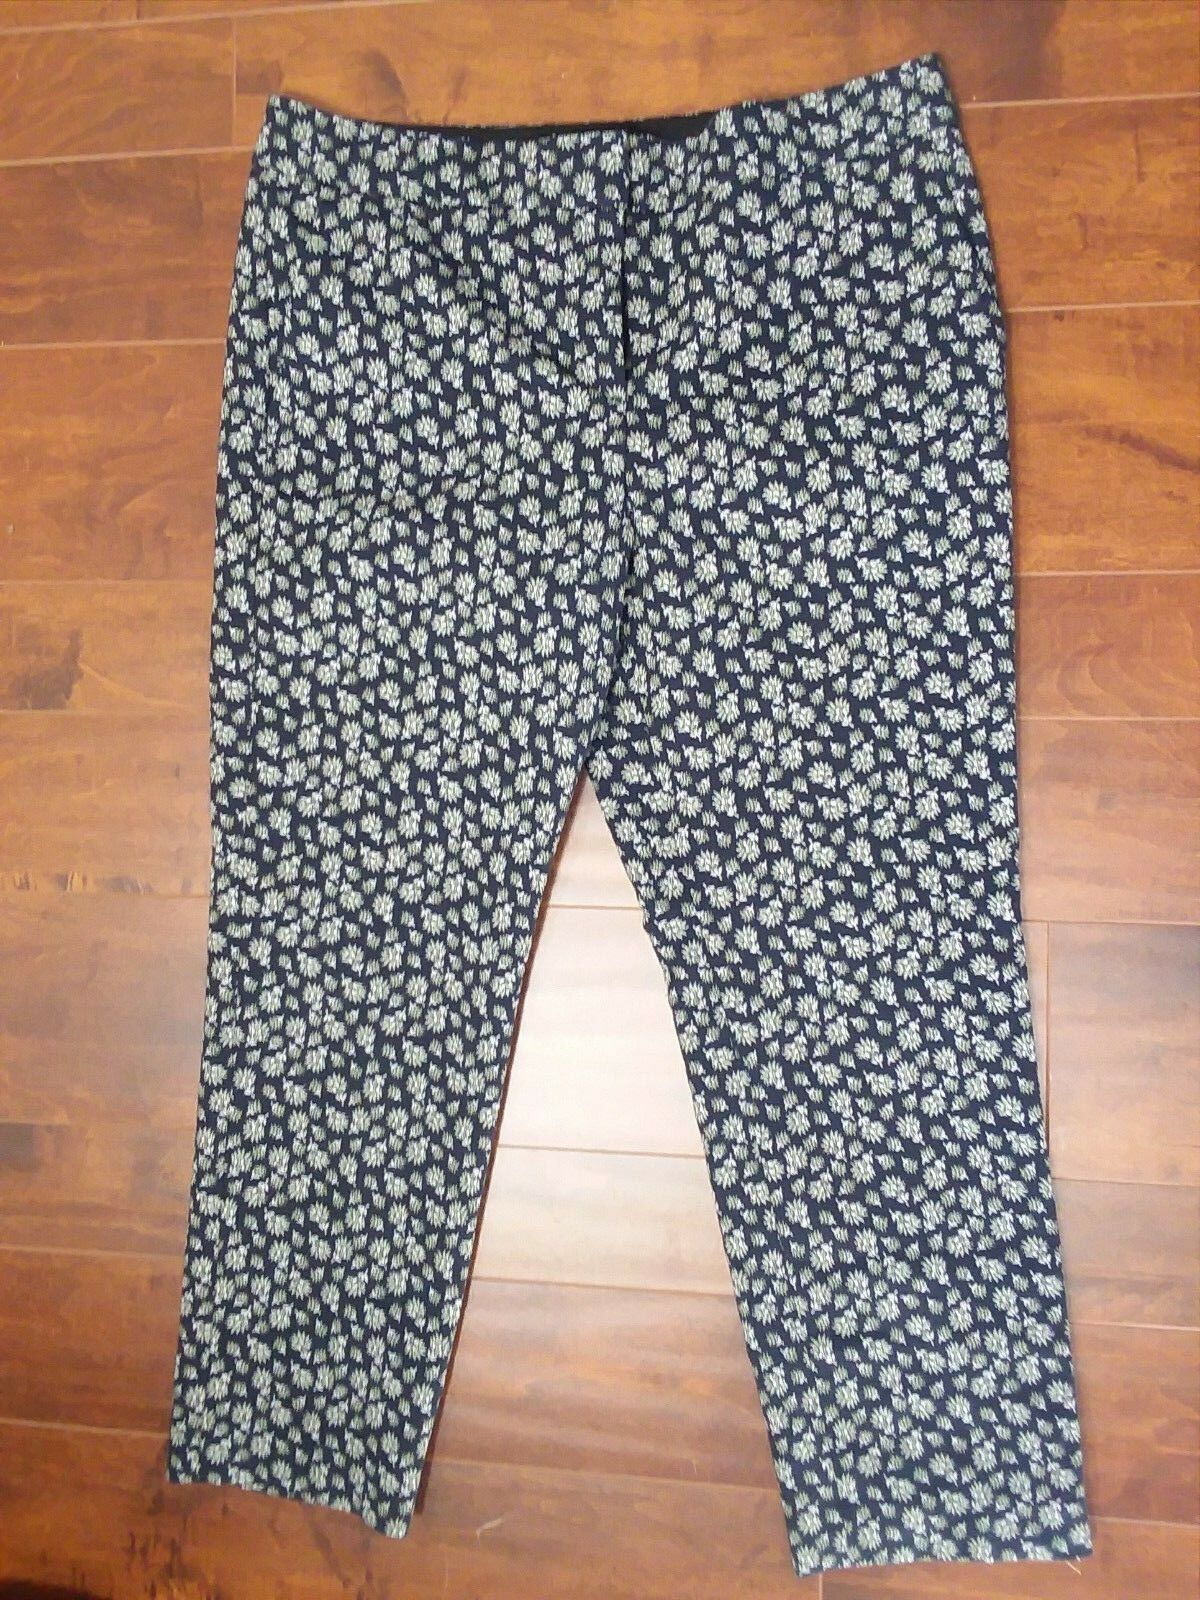 Ann Taylor Devin Straightest Fit Dress Pants Floral Women Size 10 NWOT HP